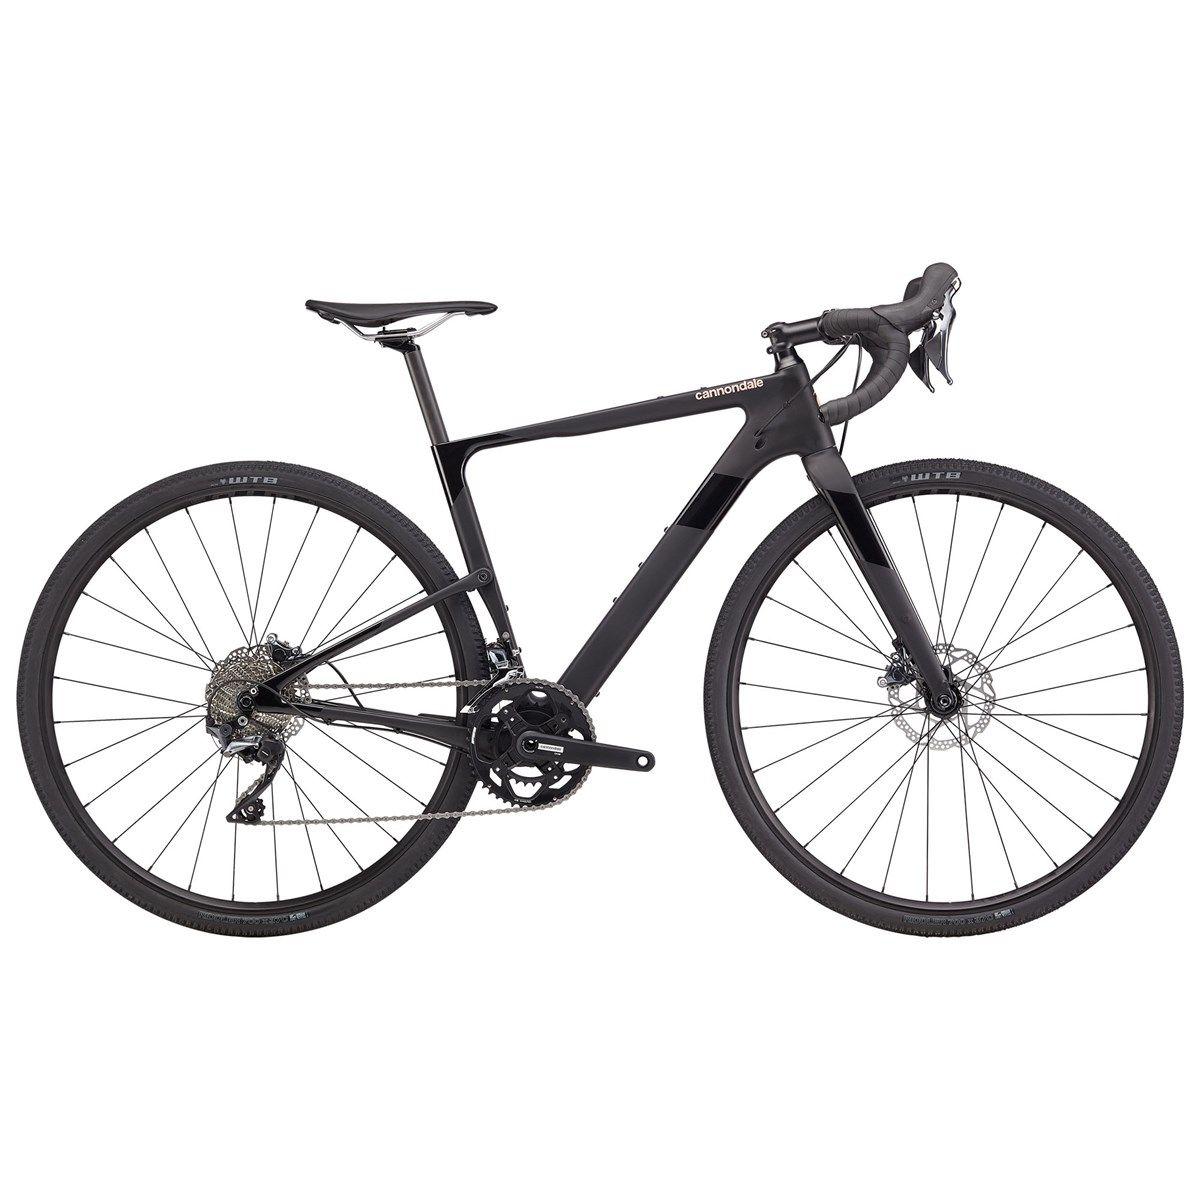 Cannondale Women S Topstone Carbon Ultegra Rx 2 Road Bike 20 In 2020 Gravel Bike Bicycle Road Bike Vintage